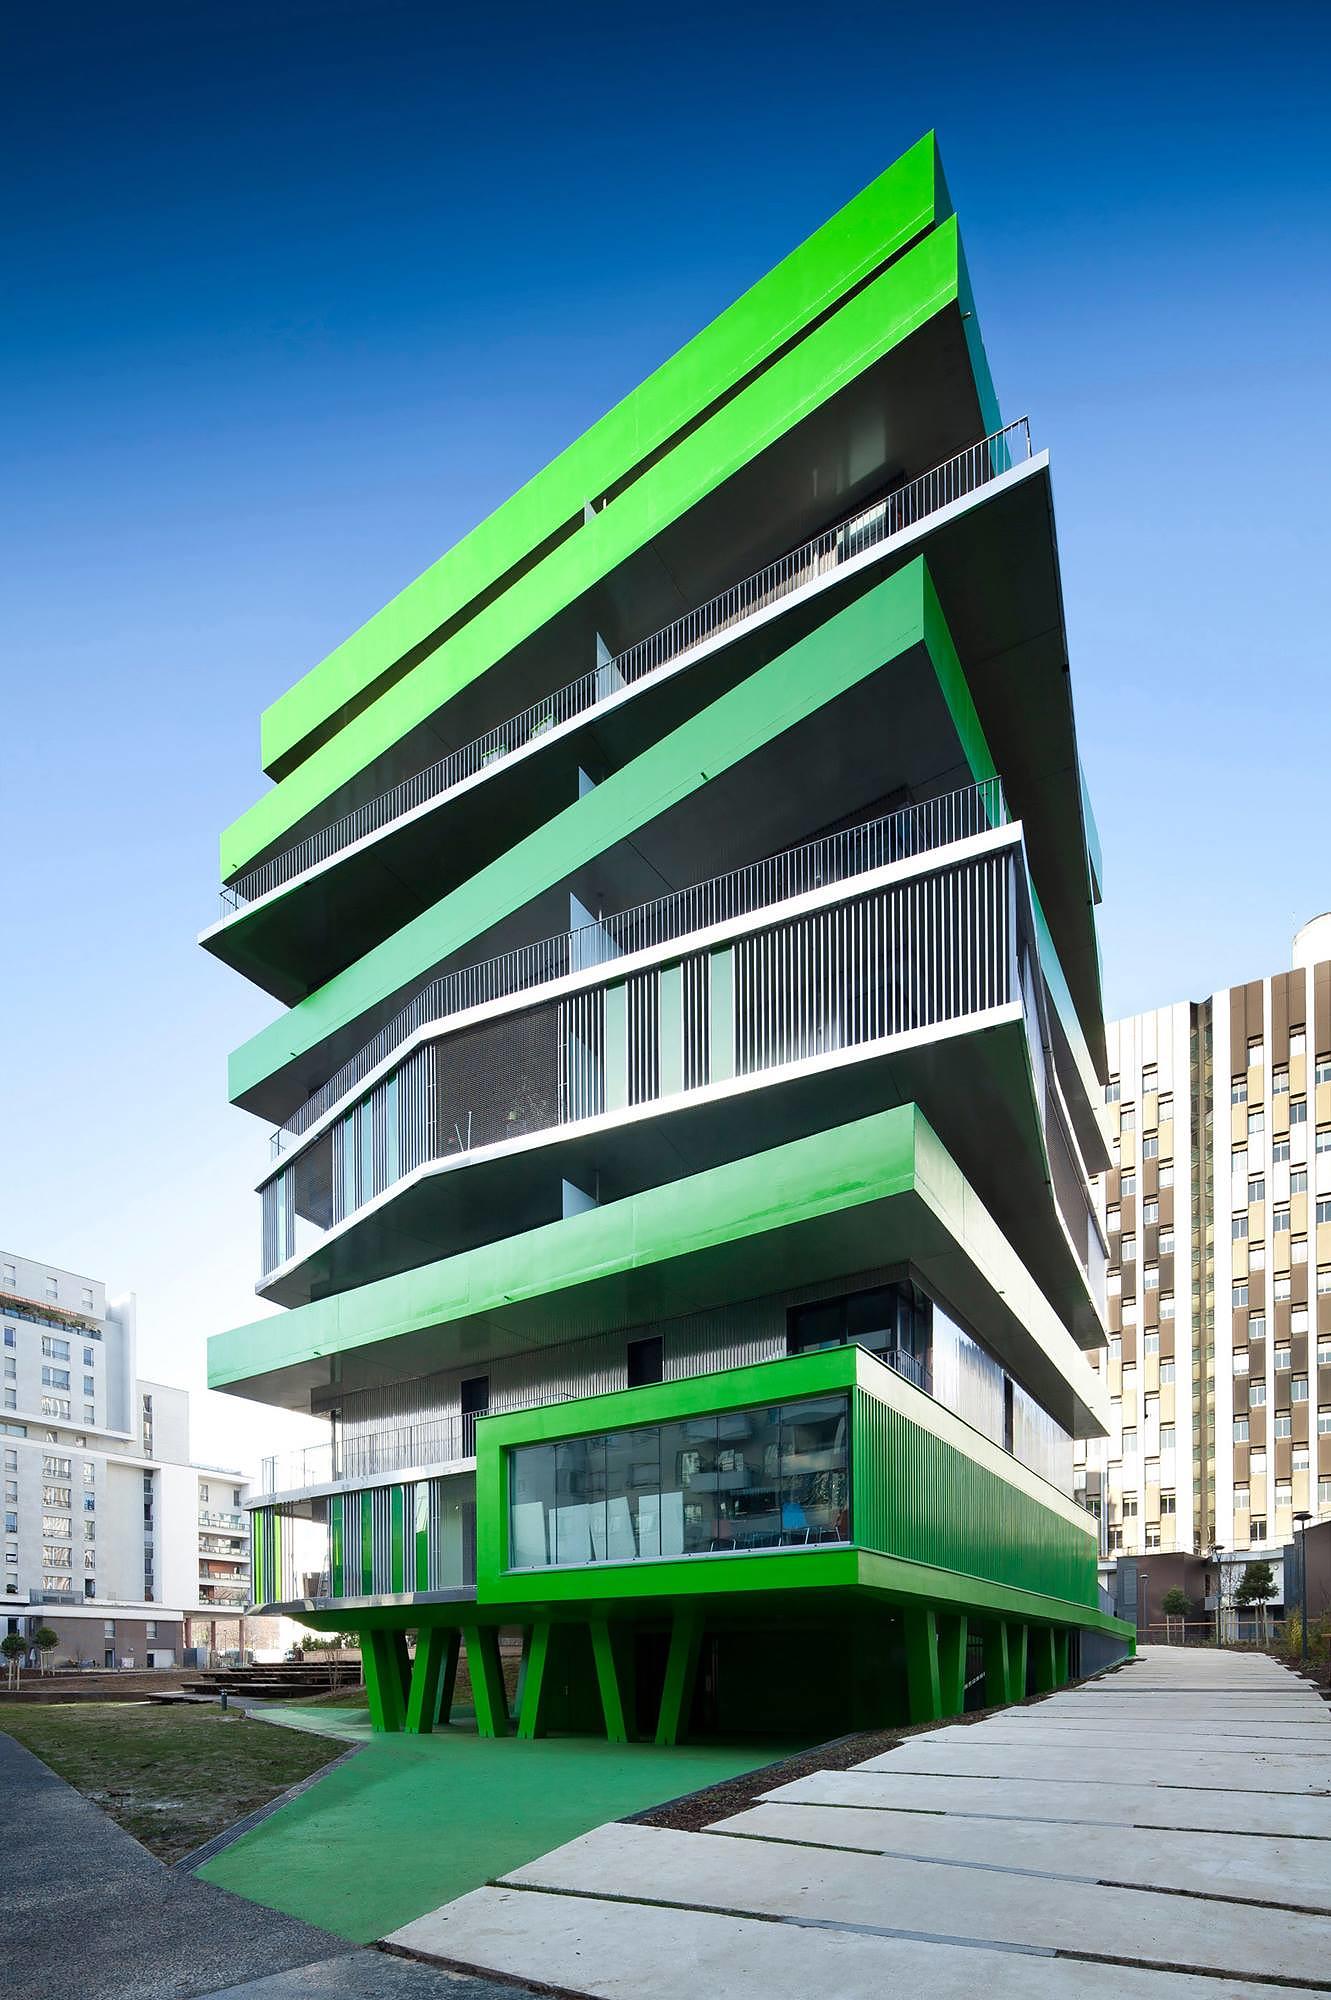 Modern Parisian Apartments by Hamonic+Masson Architects.